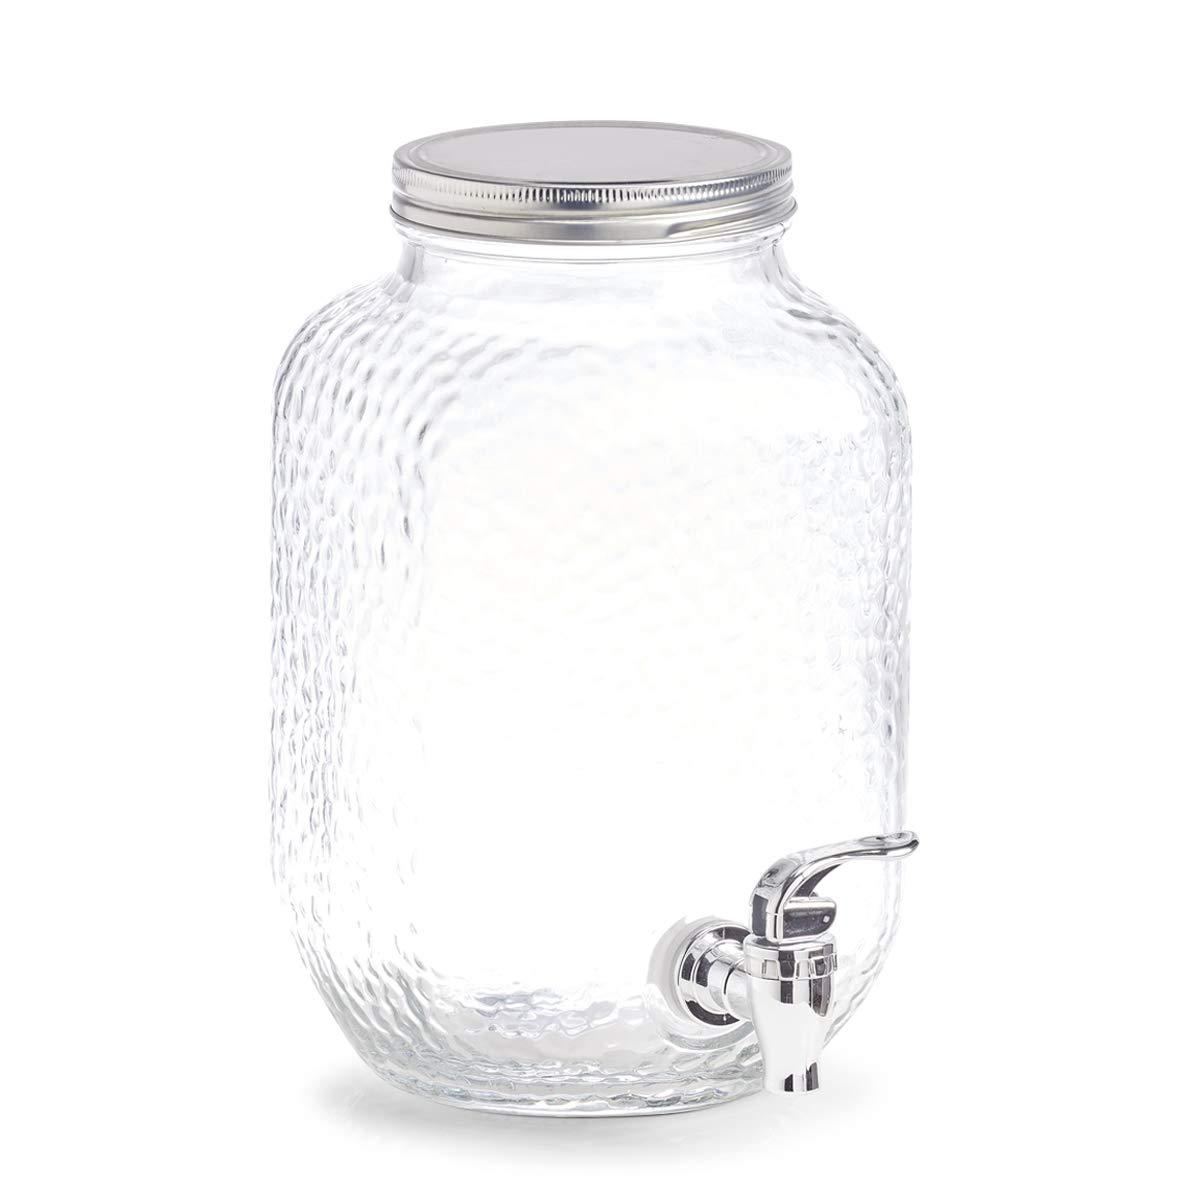 3,7 ltr 4 x 15 20 4 cm Glas//Metall 2 x 25 transparent ca Zeller Getr/änkespender